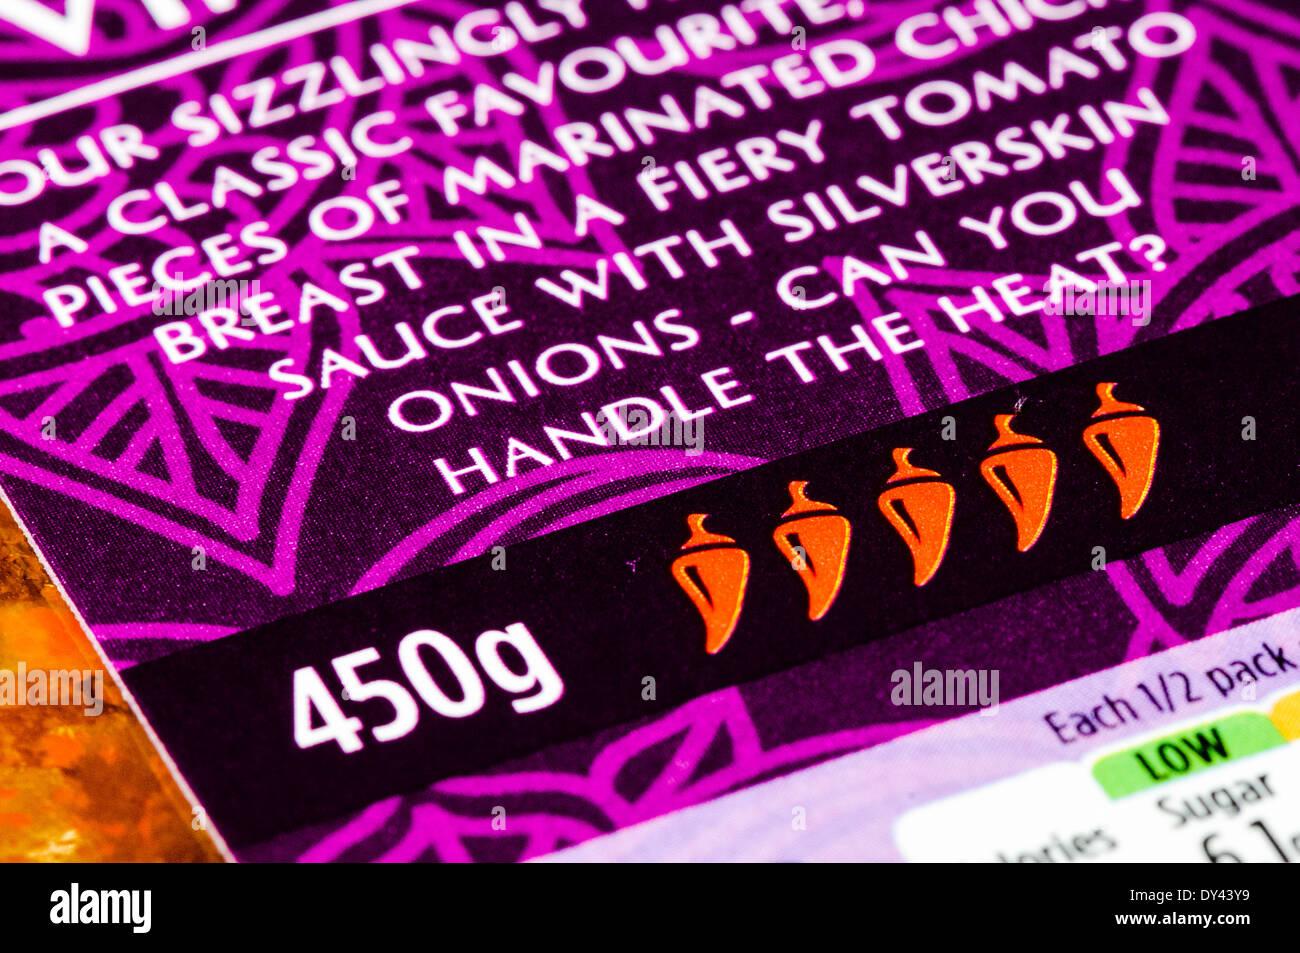 Fivi chilli mark on a pack of hot vindaloo - Stock Image